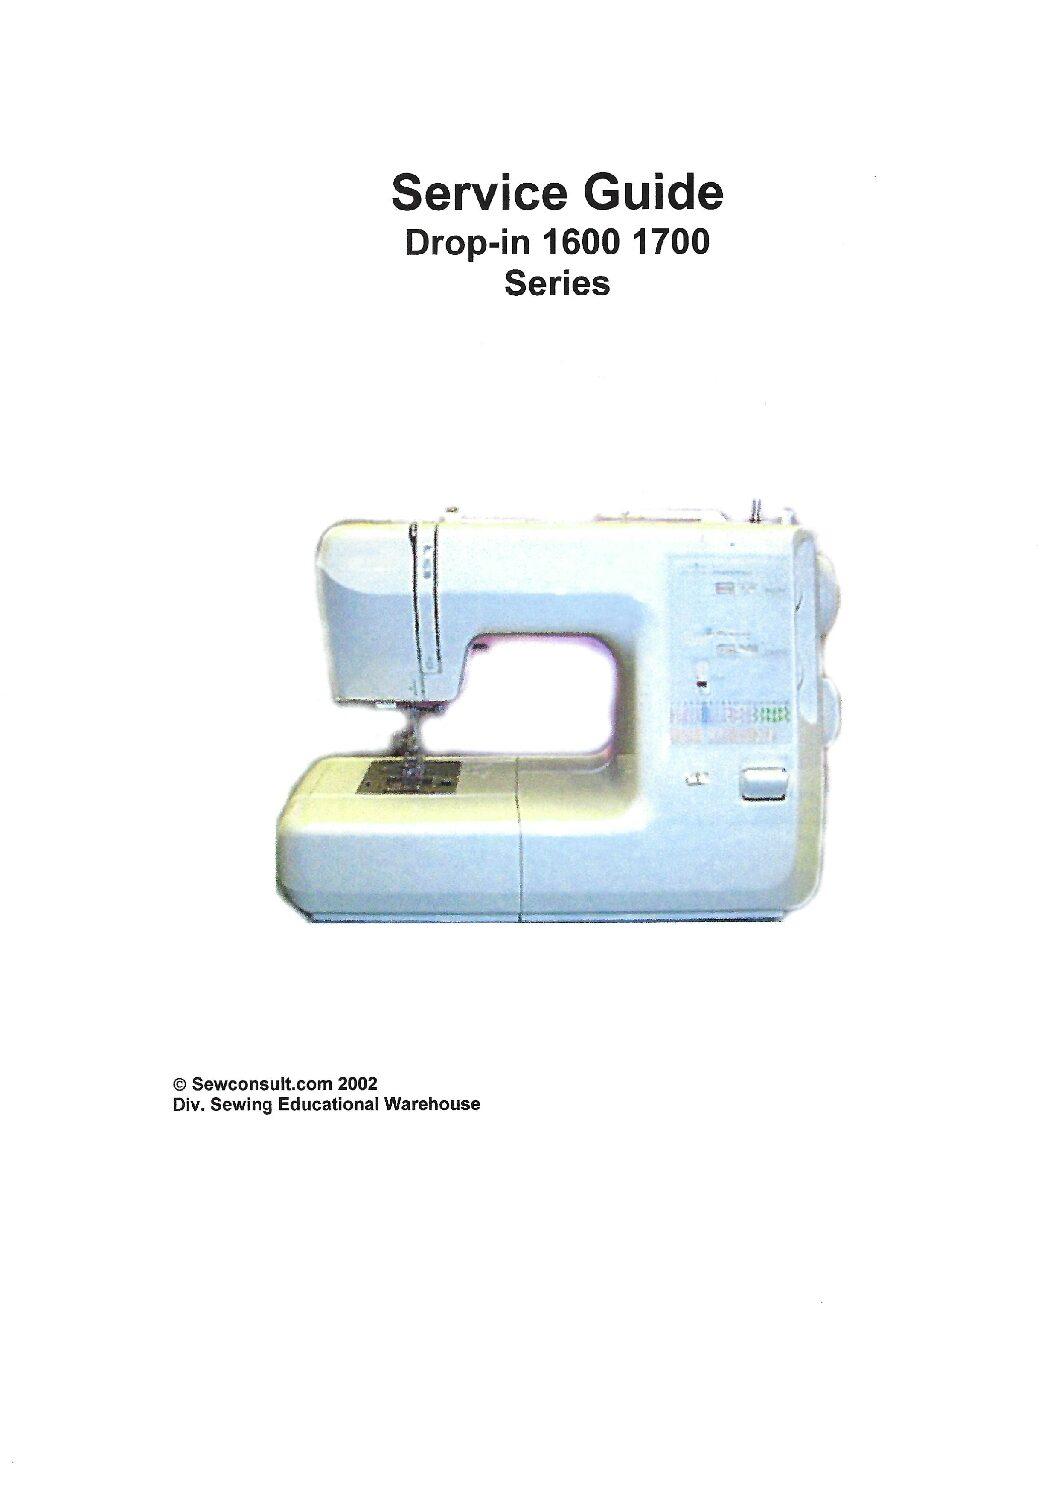 Kenmore Sewing Machine Feet : kenmore, sewing, machine, Service, Manual, Kenmore, 385.1600/1700, Sewing, Machine